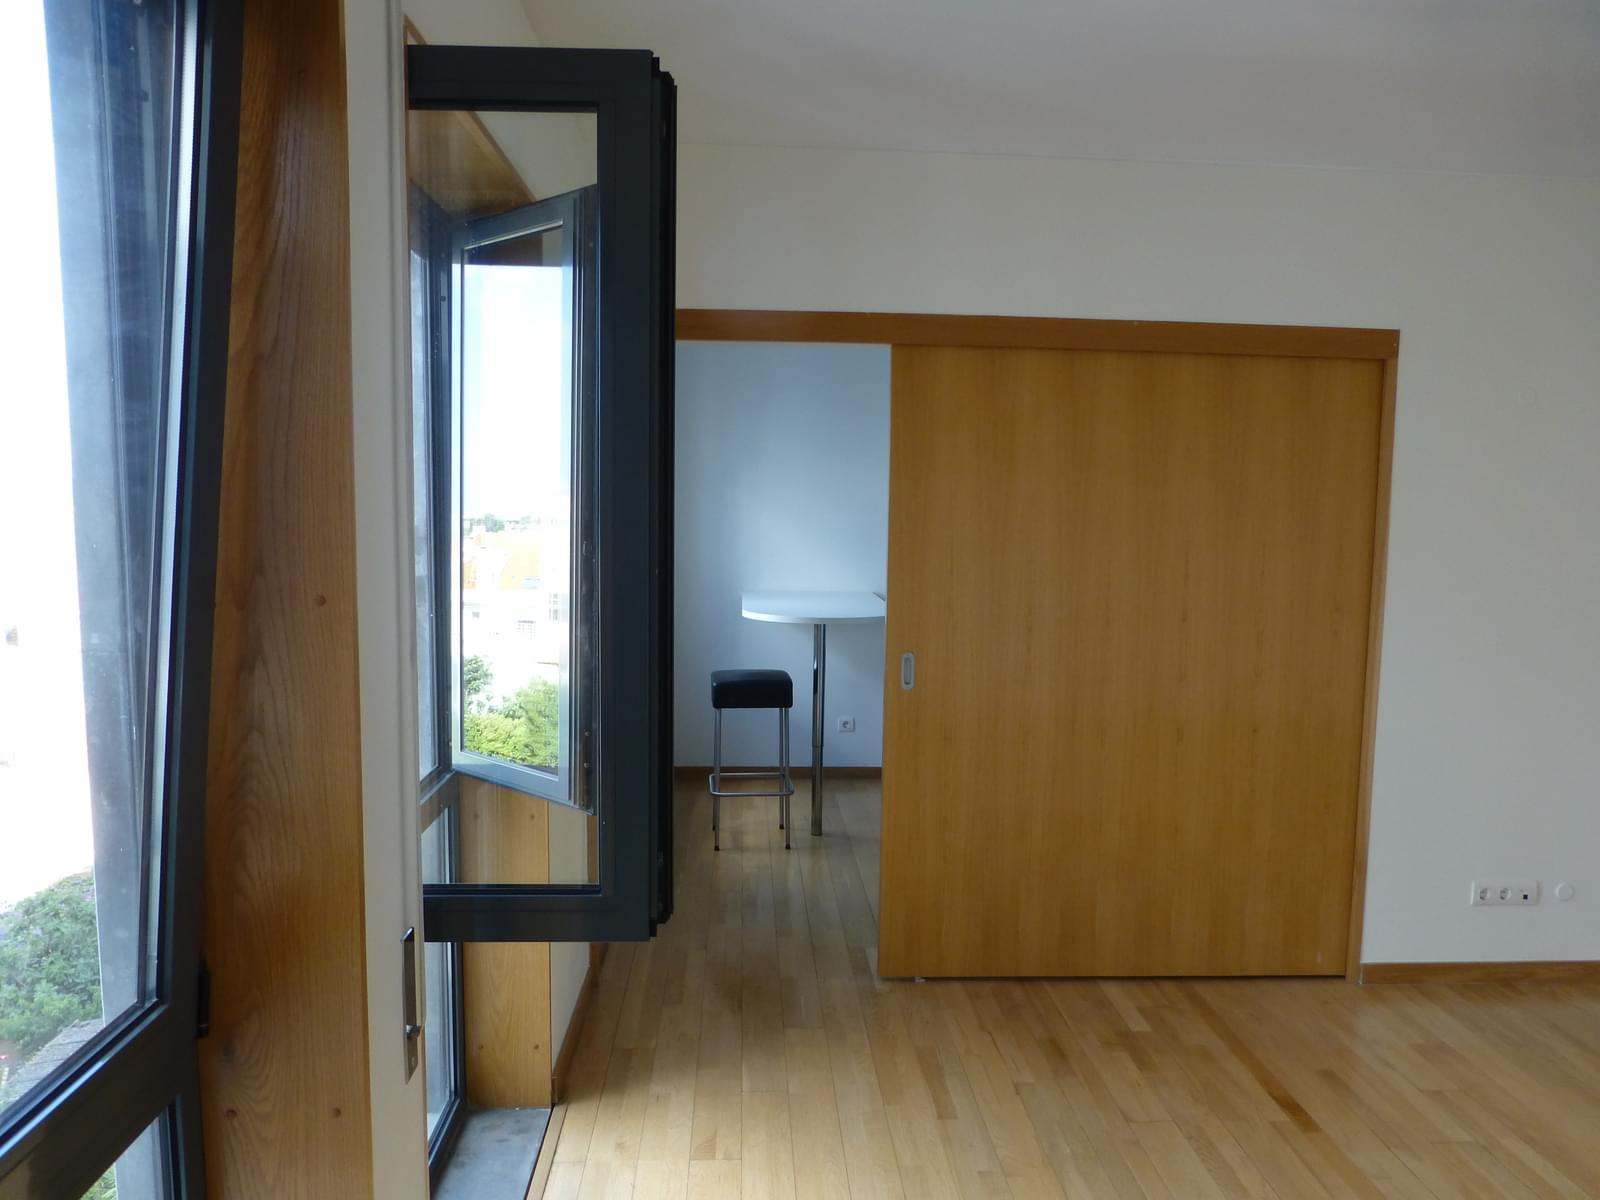 pf17050-apartamento-t1-lisboa-24ab0655-5c4a-494a-a8bb-b83e4bb1d853